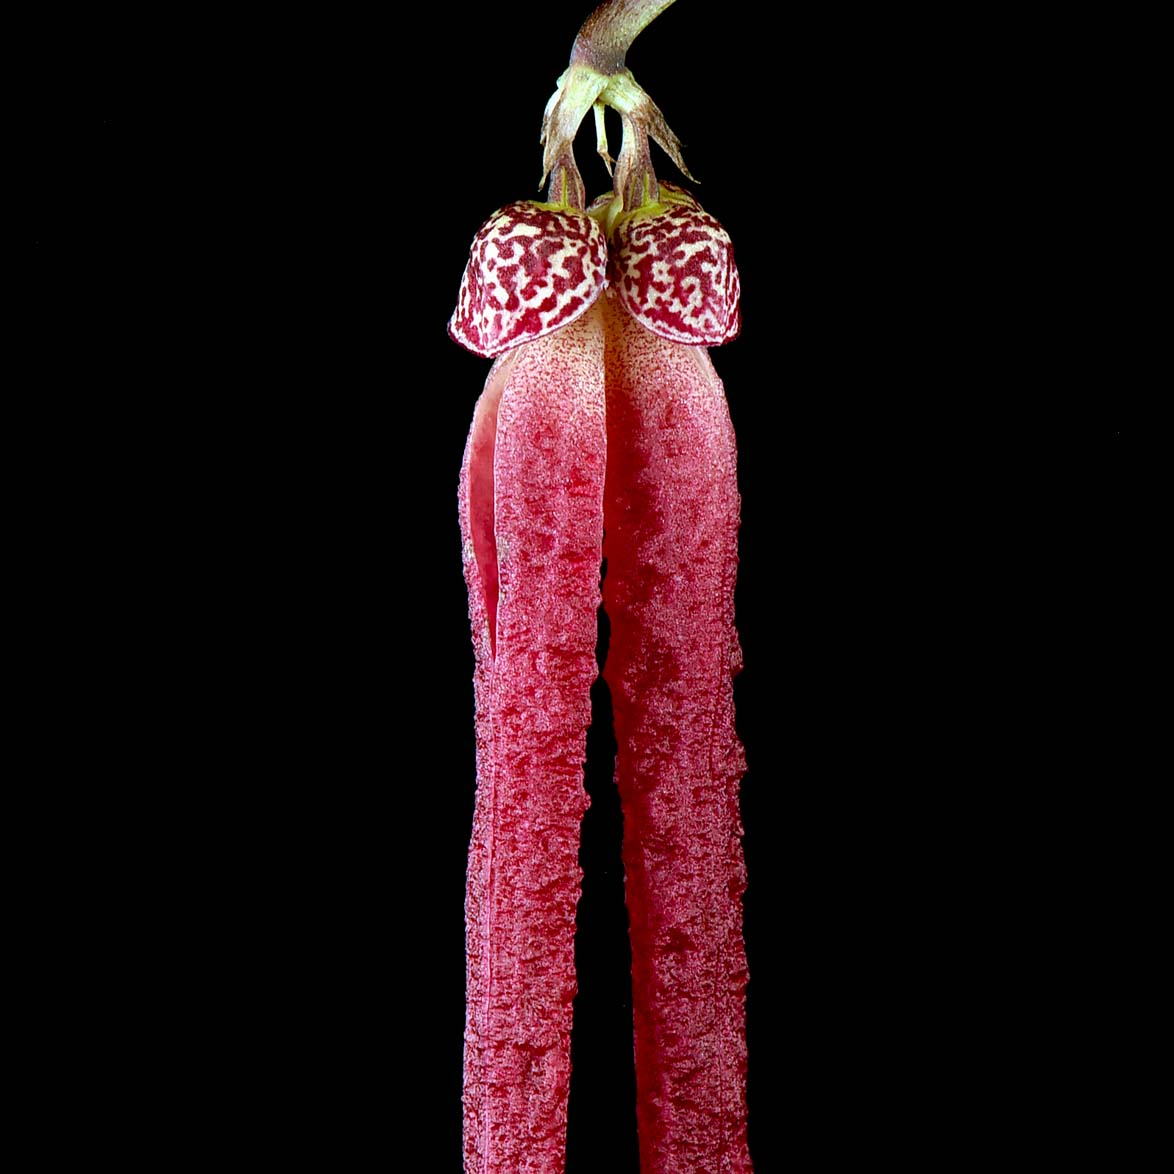 Bulbophyllum jacobsonii